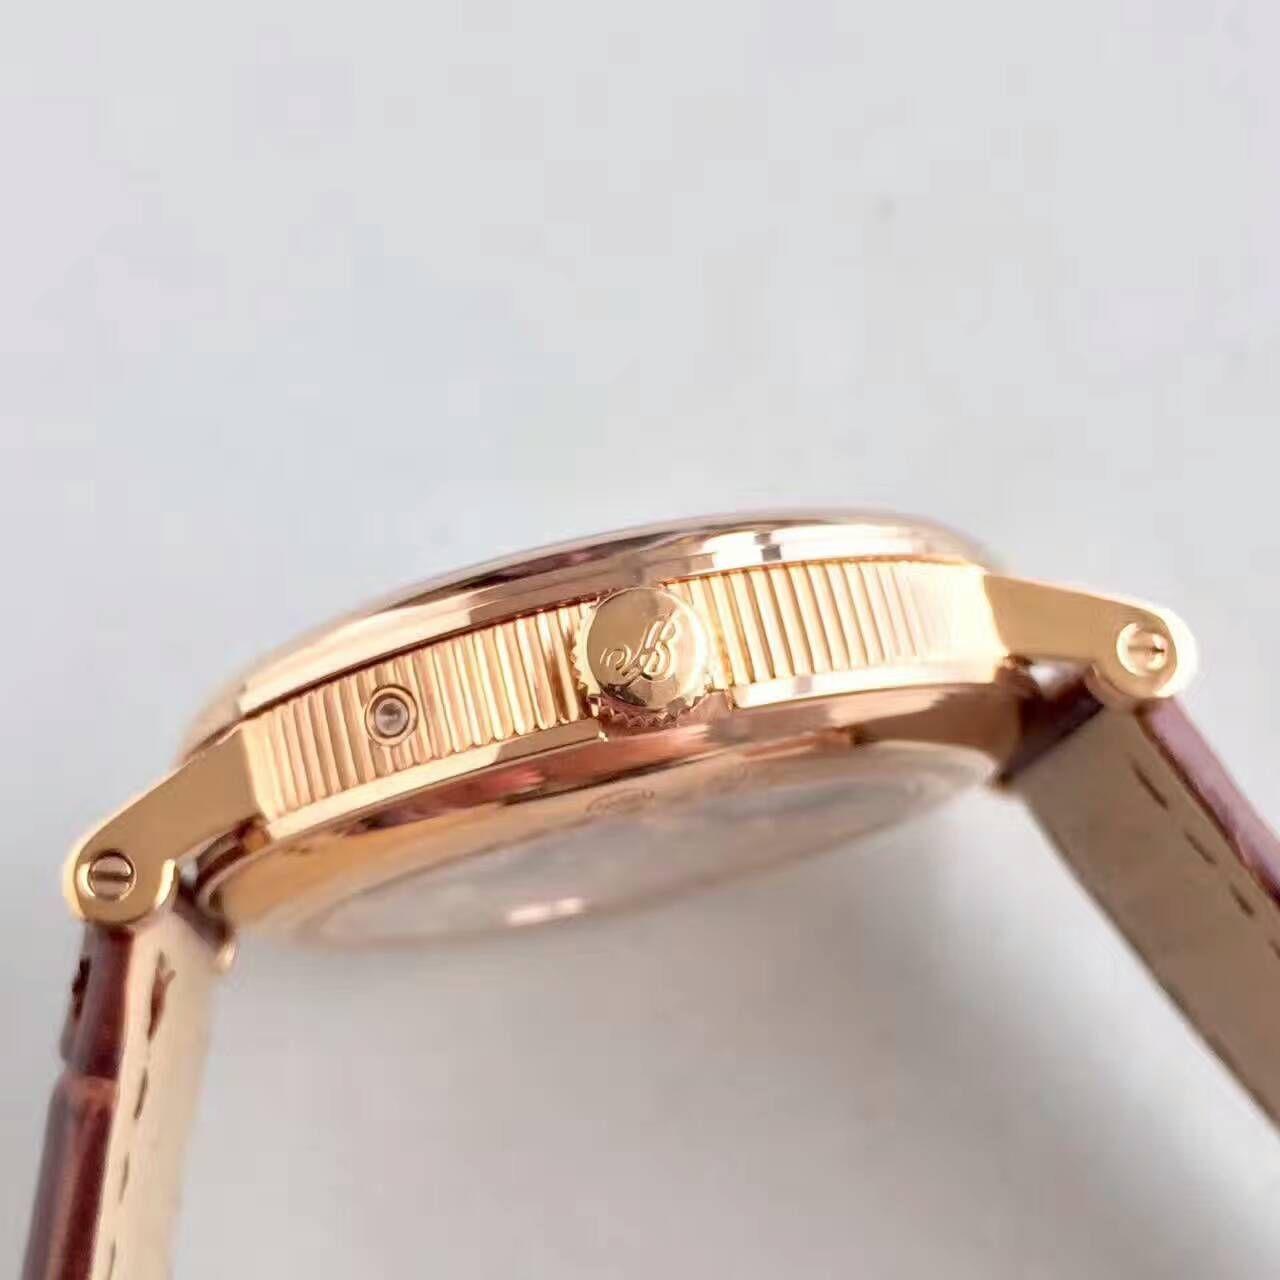 【VF厂一比一高仿手表】宝玑经典系列3137BR/11/986玫瑰金腕表 / BZ029